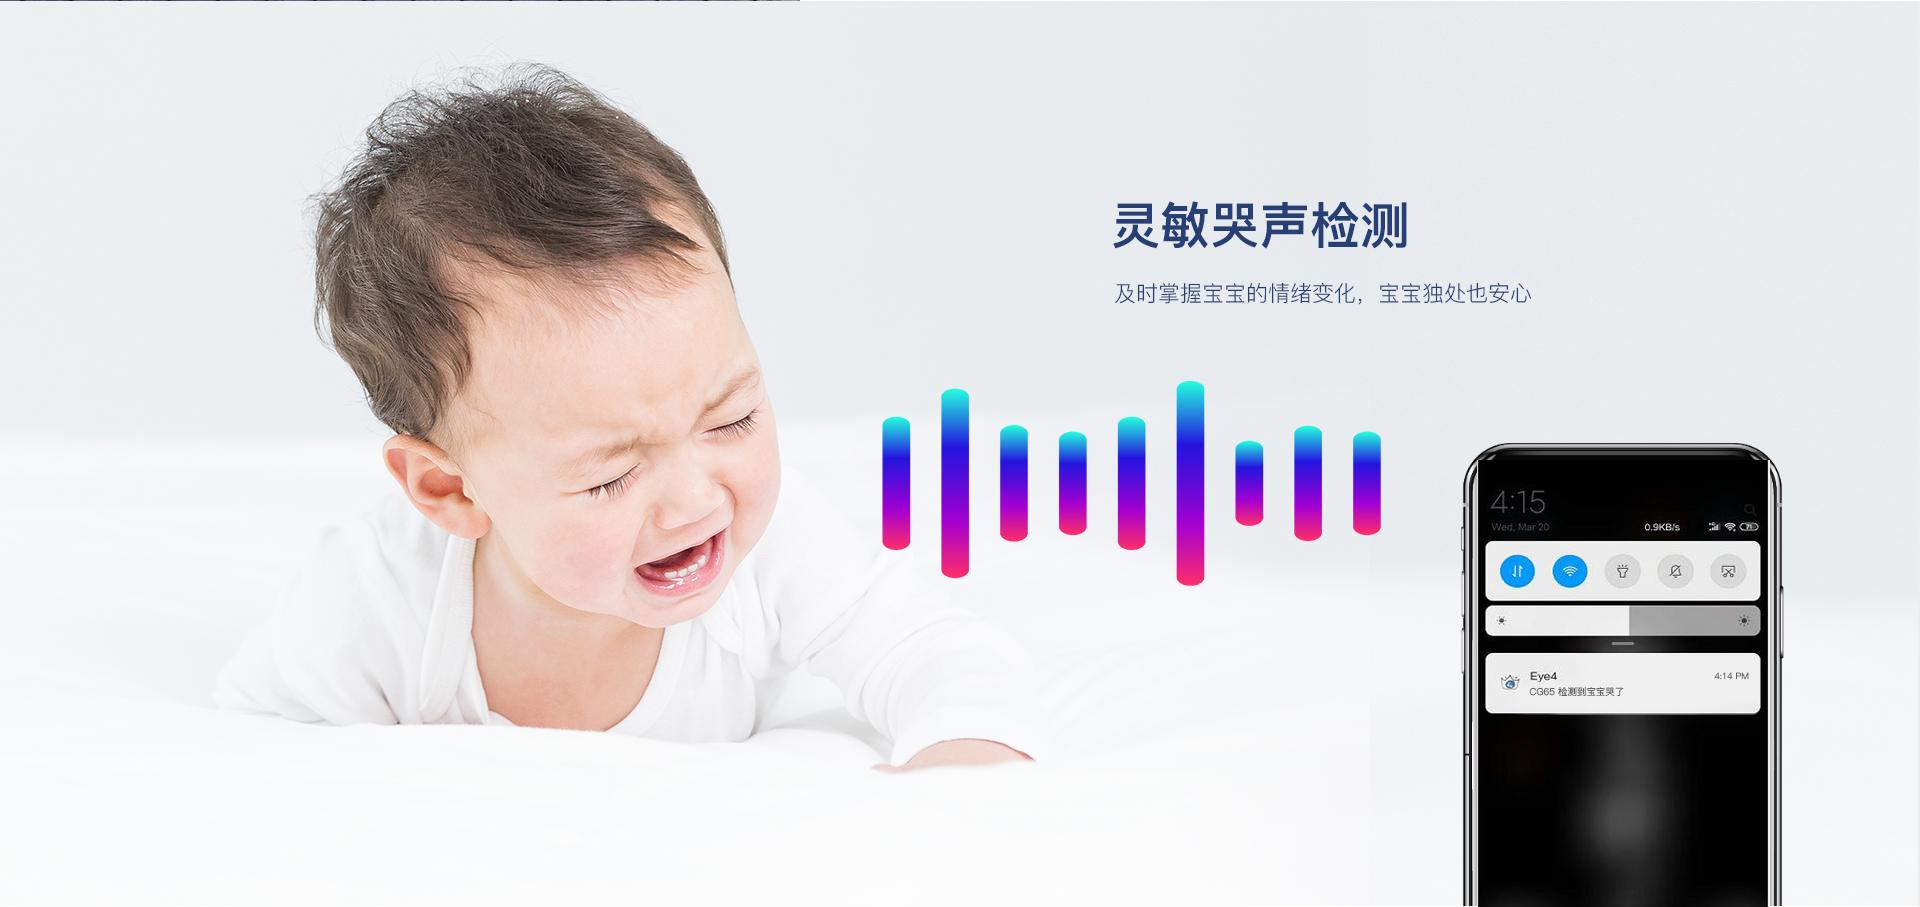 4G监控beplay头